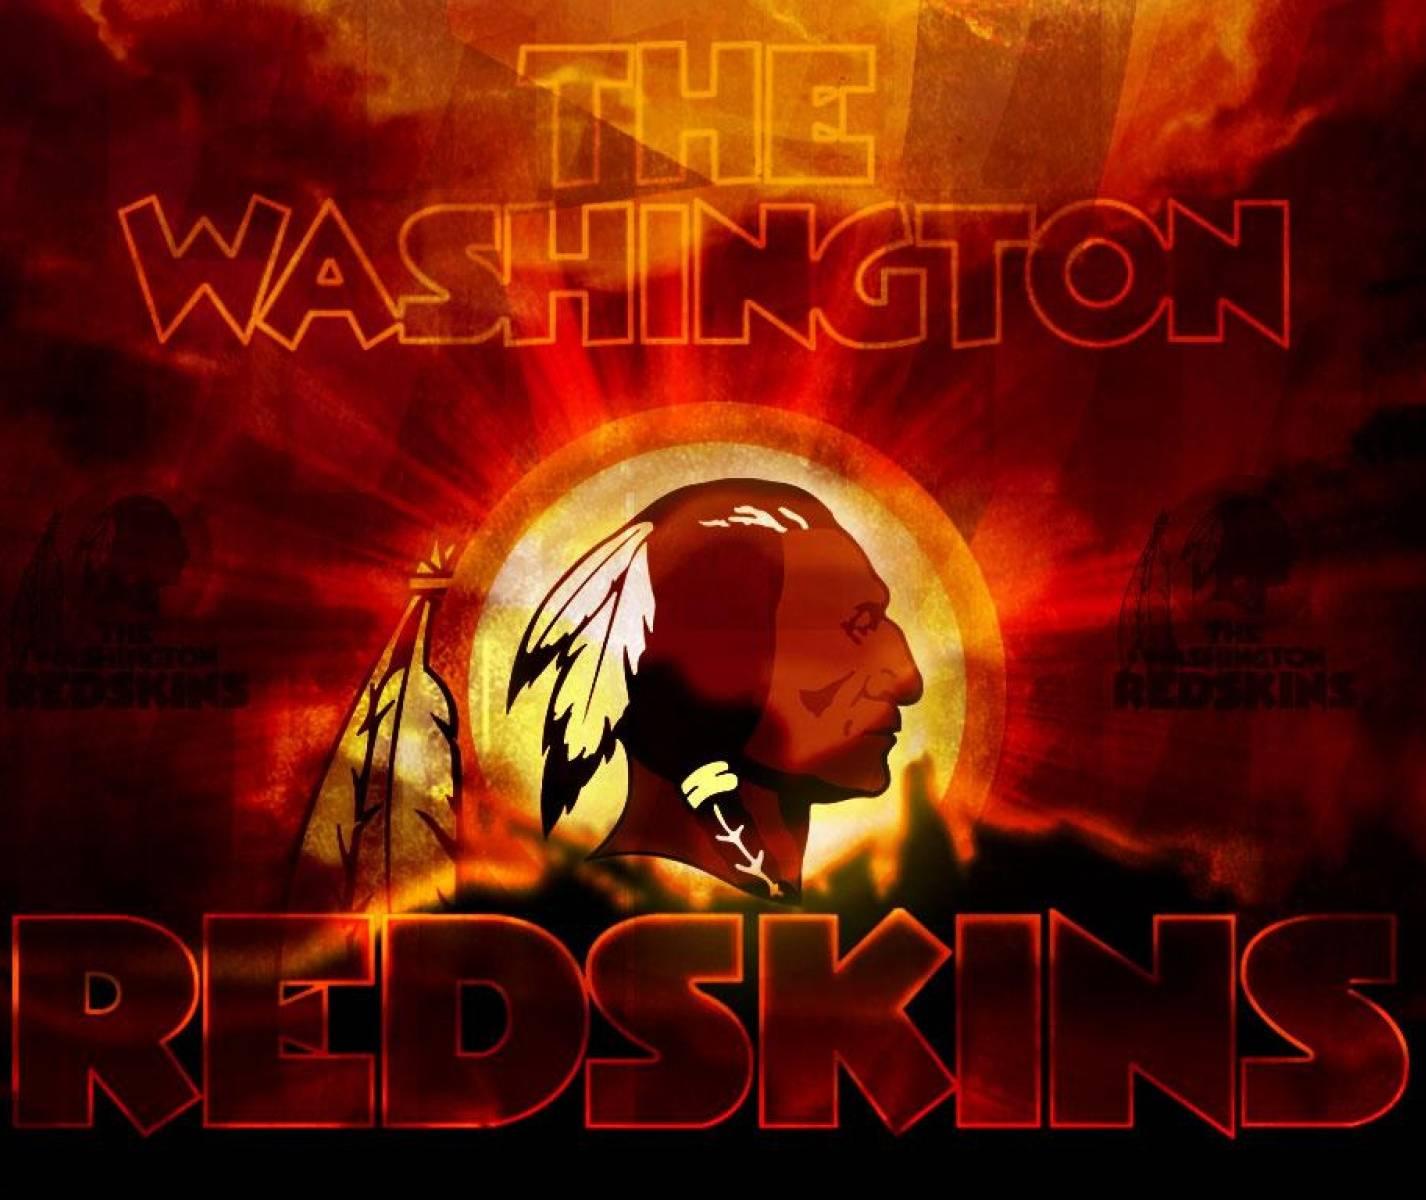 Washington Redskins wallpaper by i_like_teens - 74 - Free ...